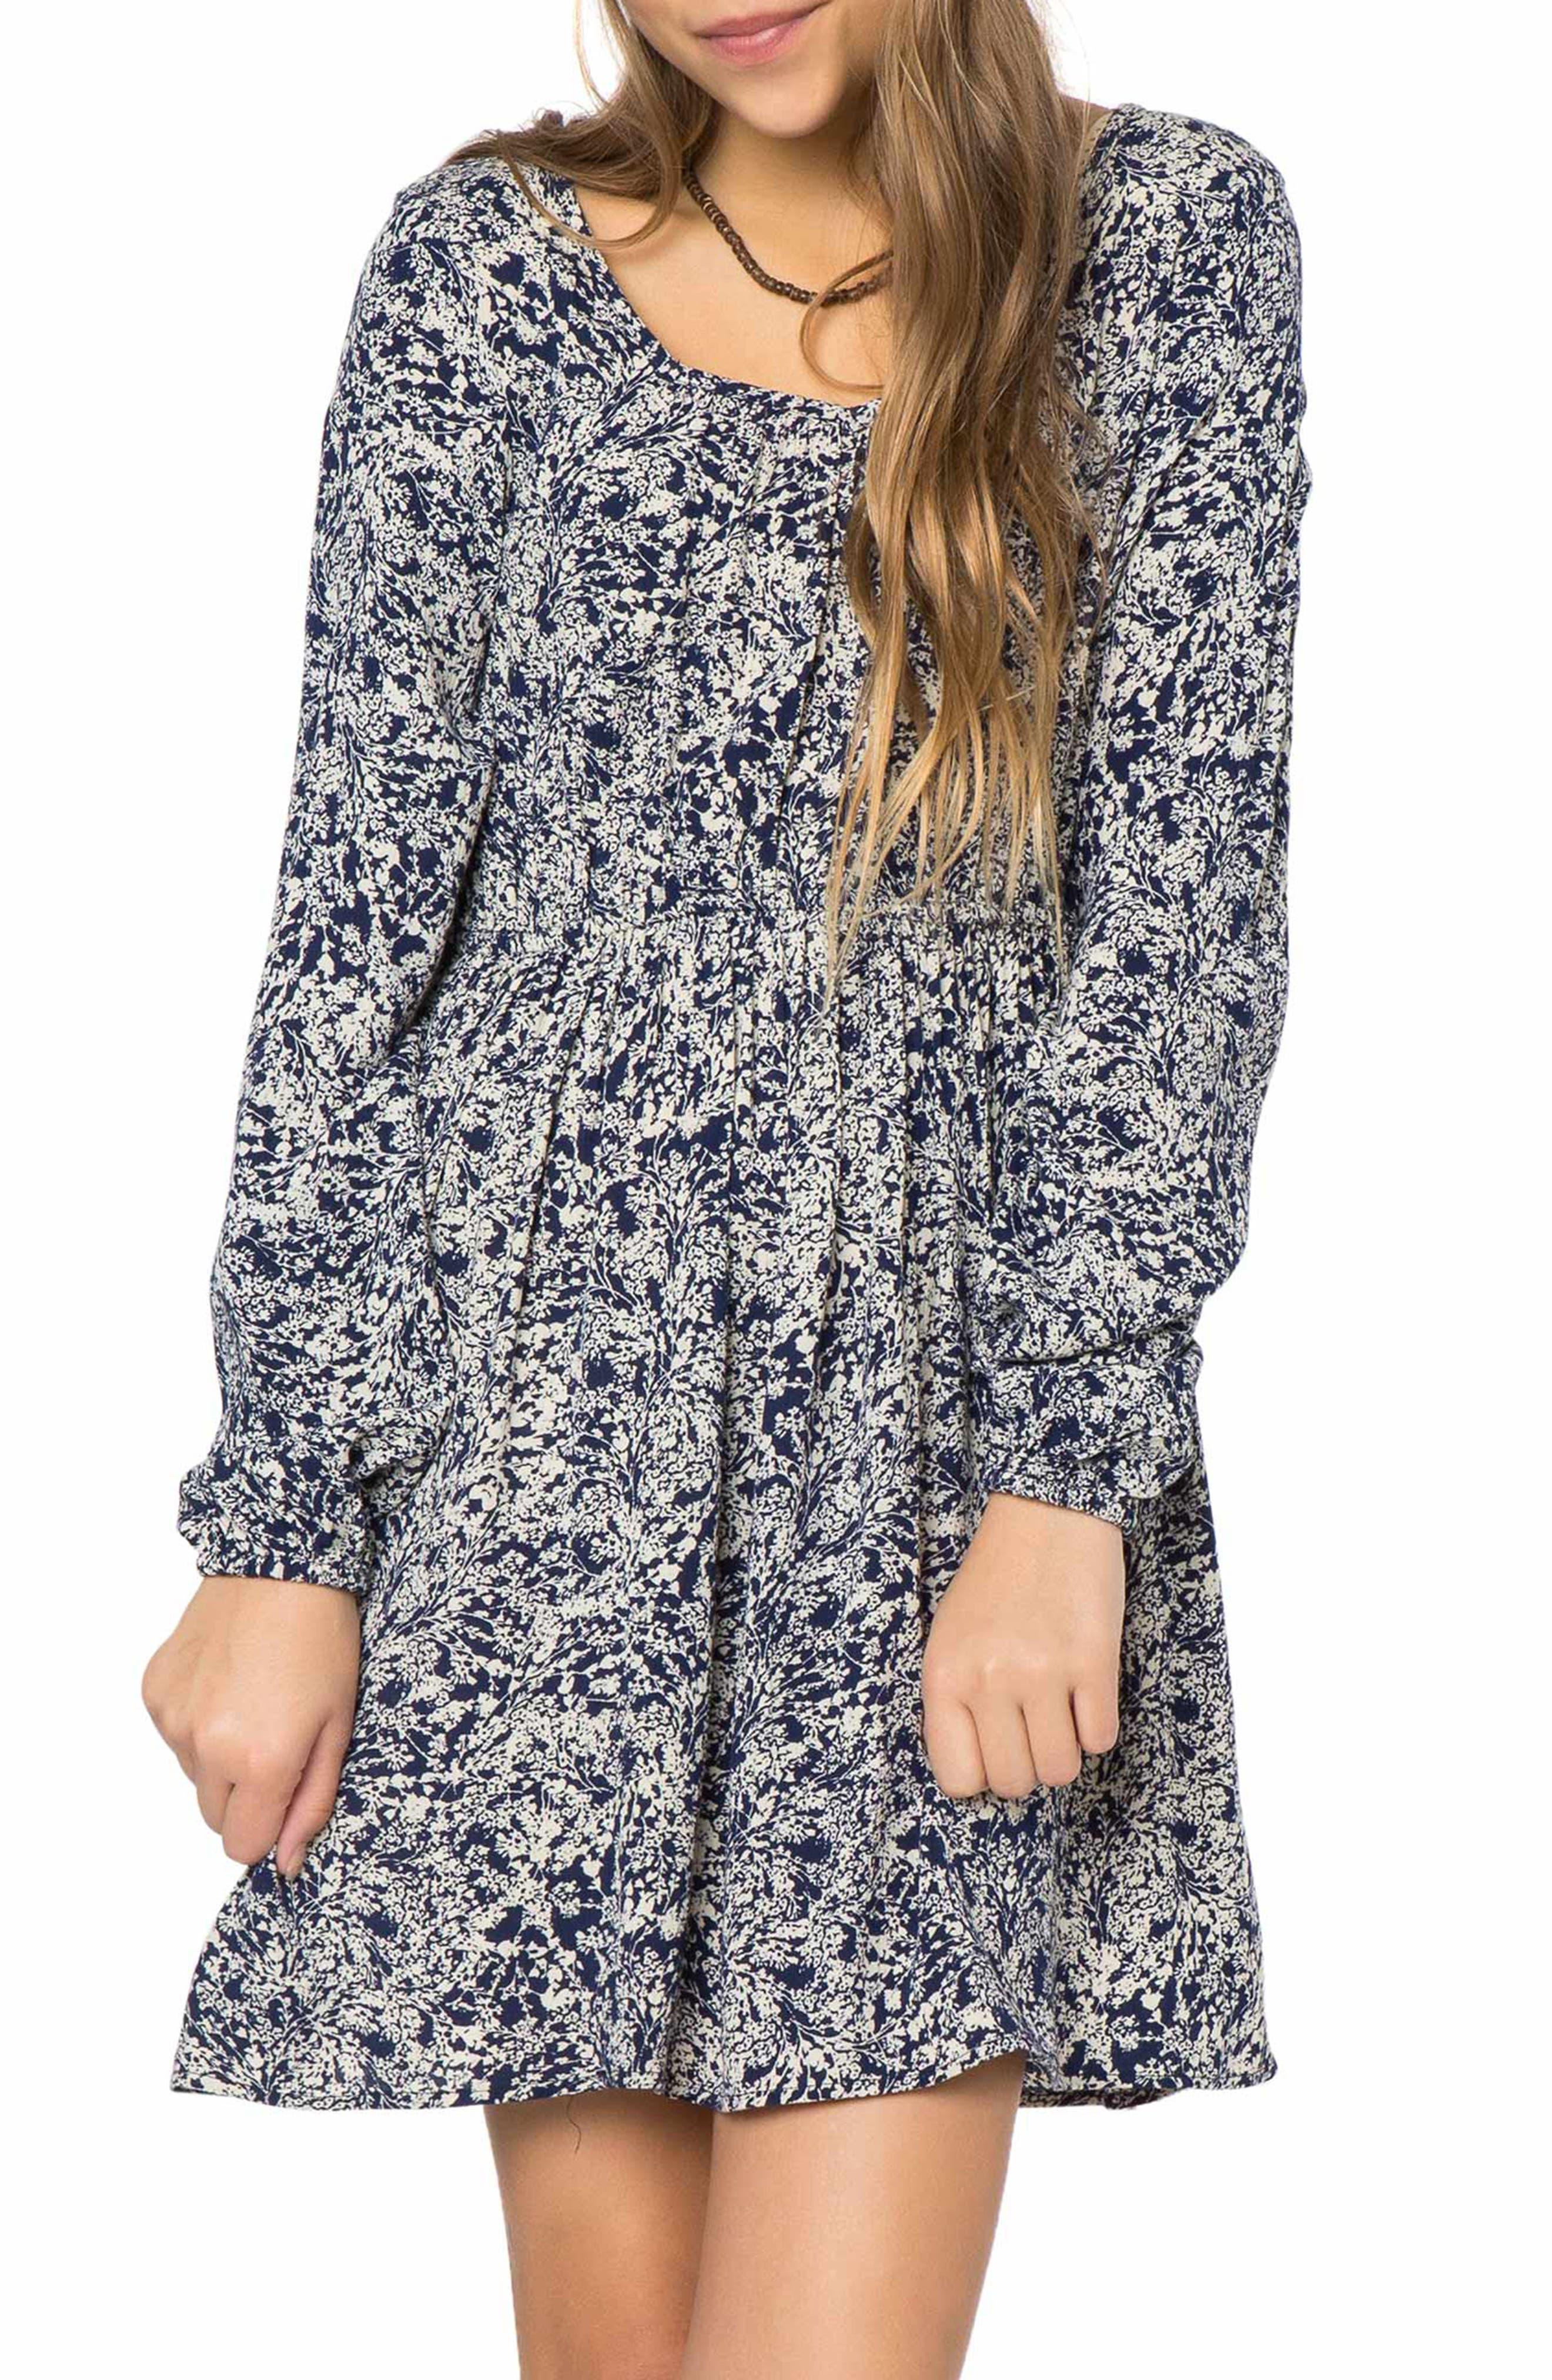 Main Image - O'Neill Rhianna Print Dress (Big Girls)